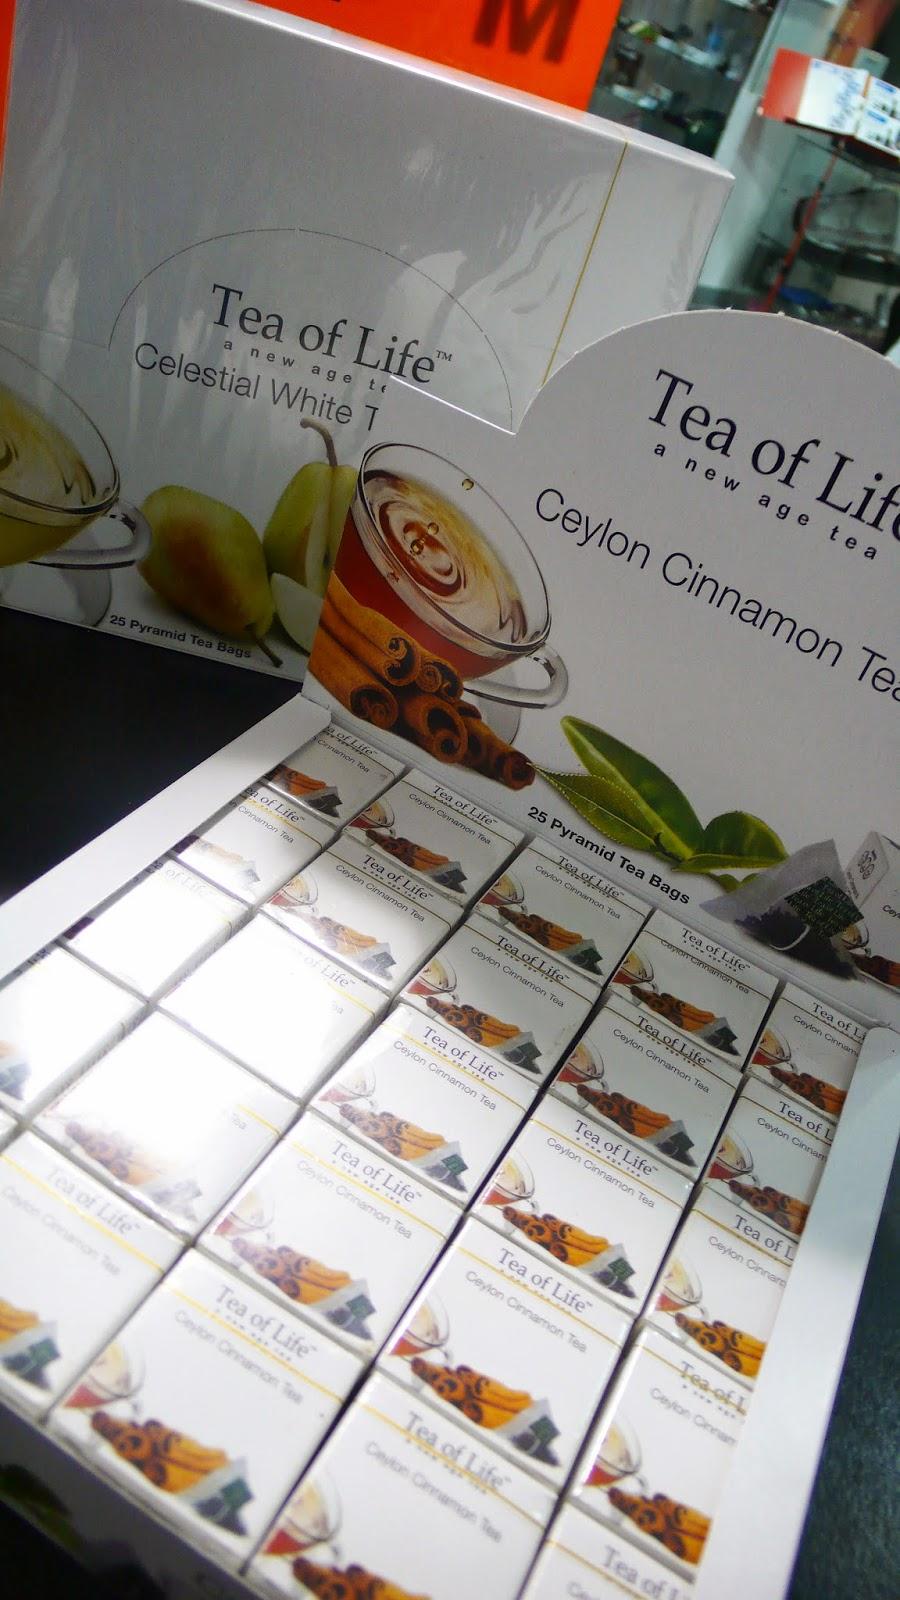 www.teaoflife.es/